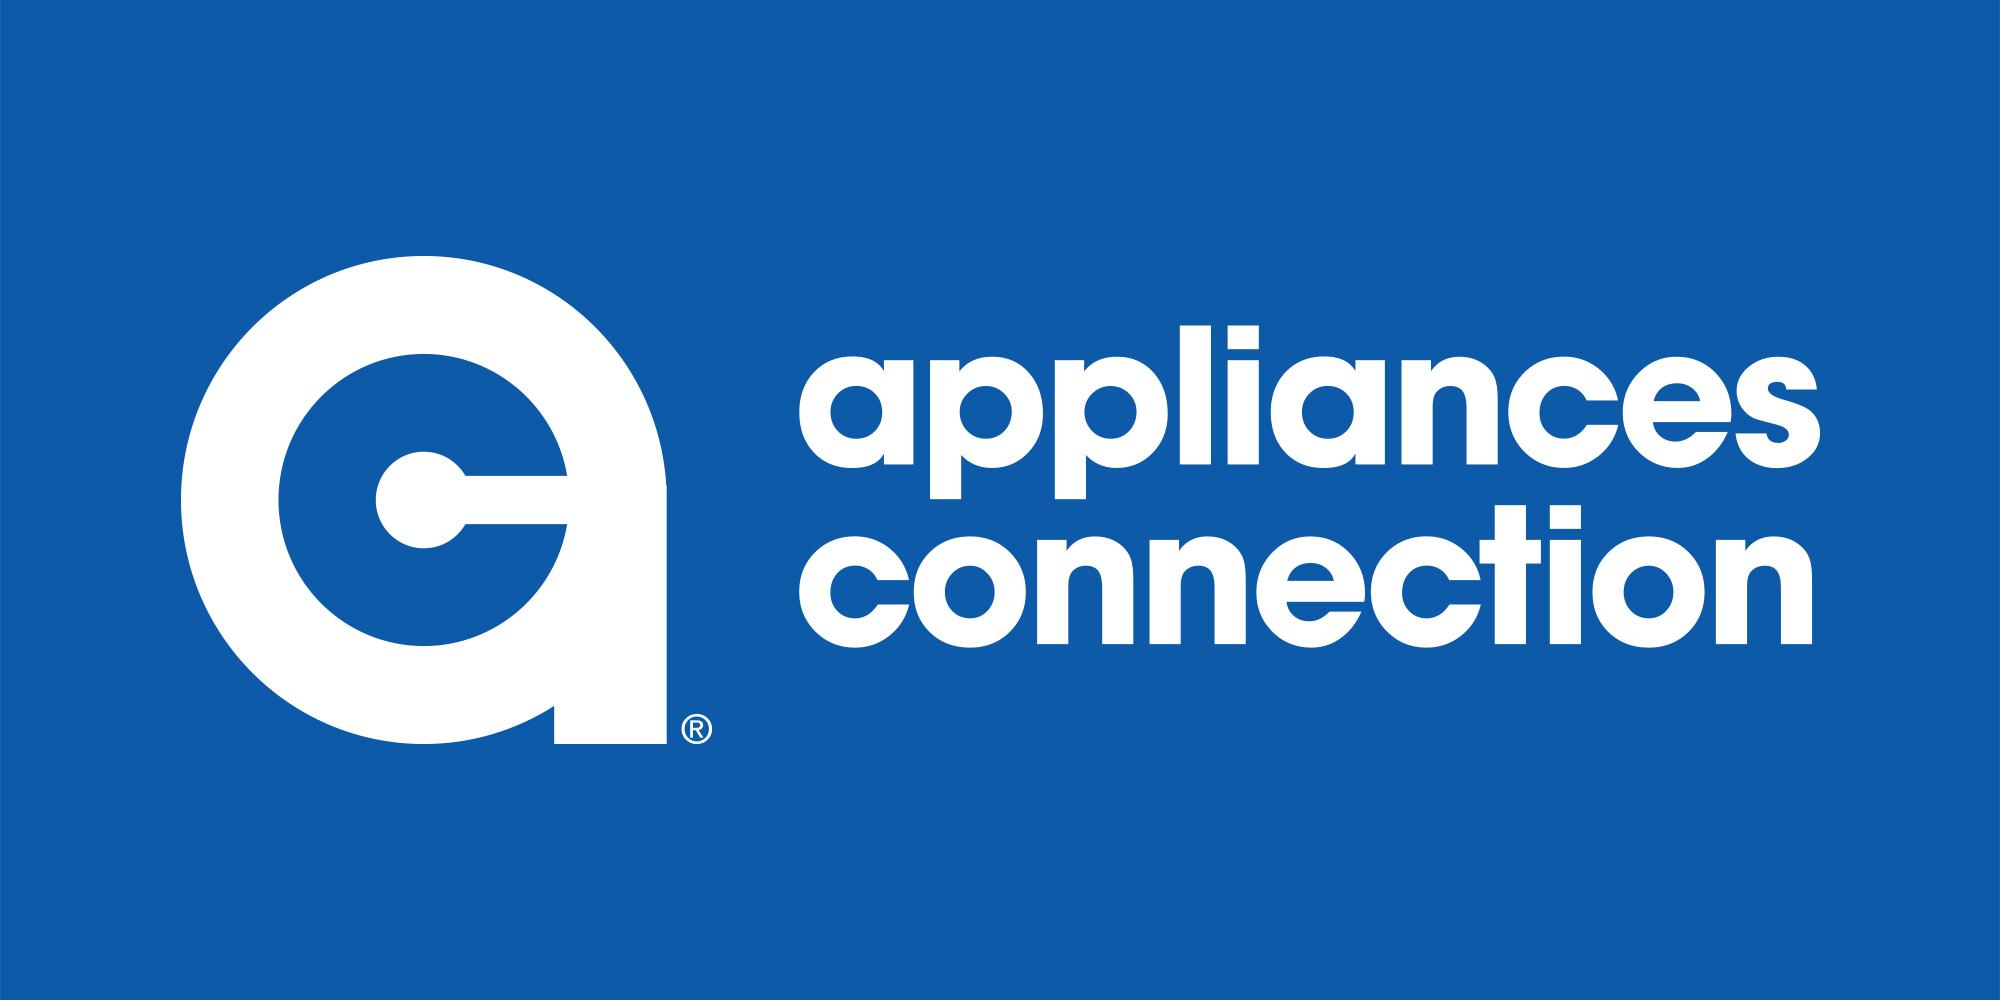 appliances-connection.jpg